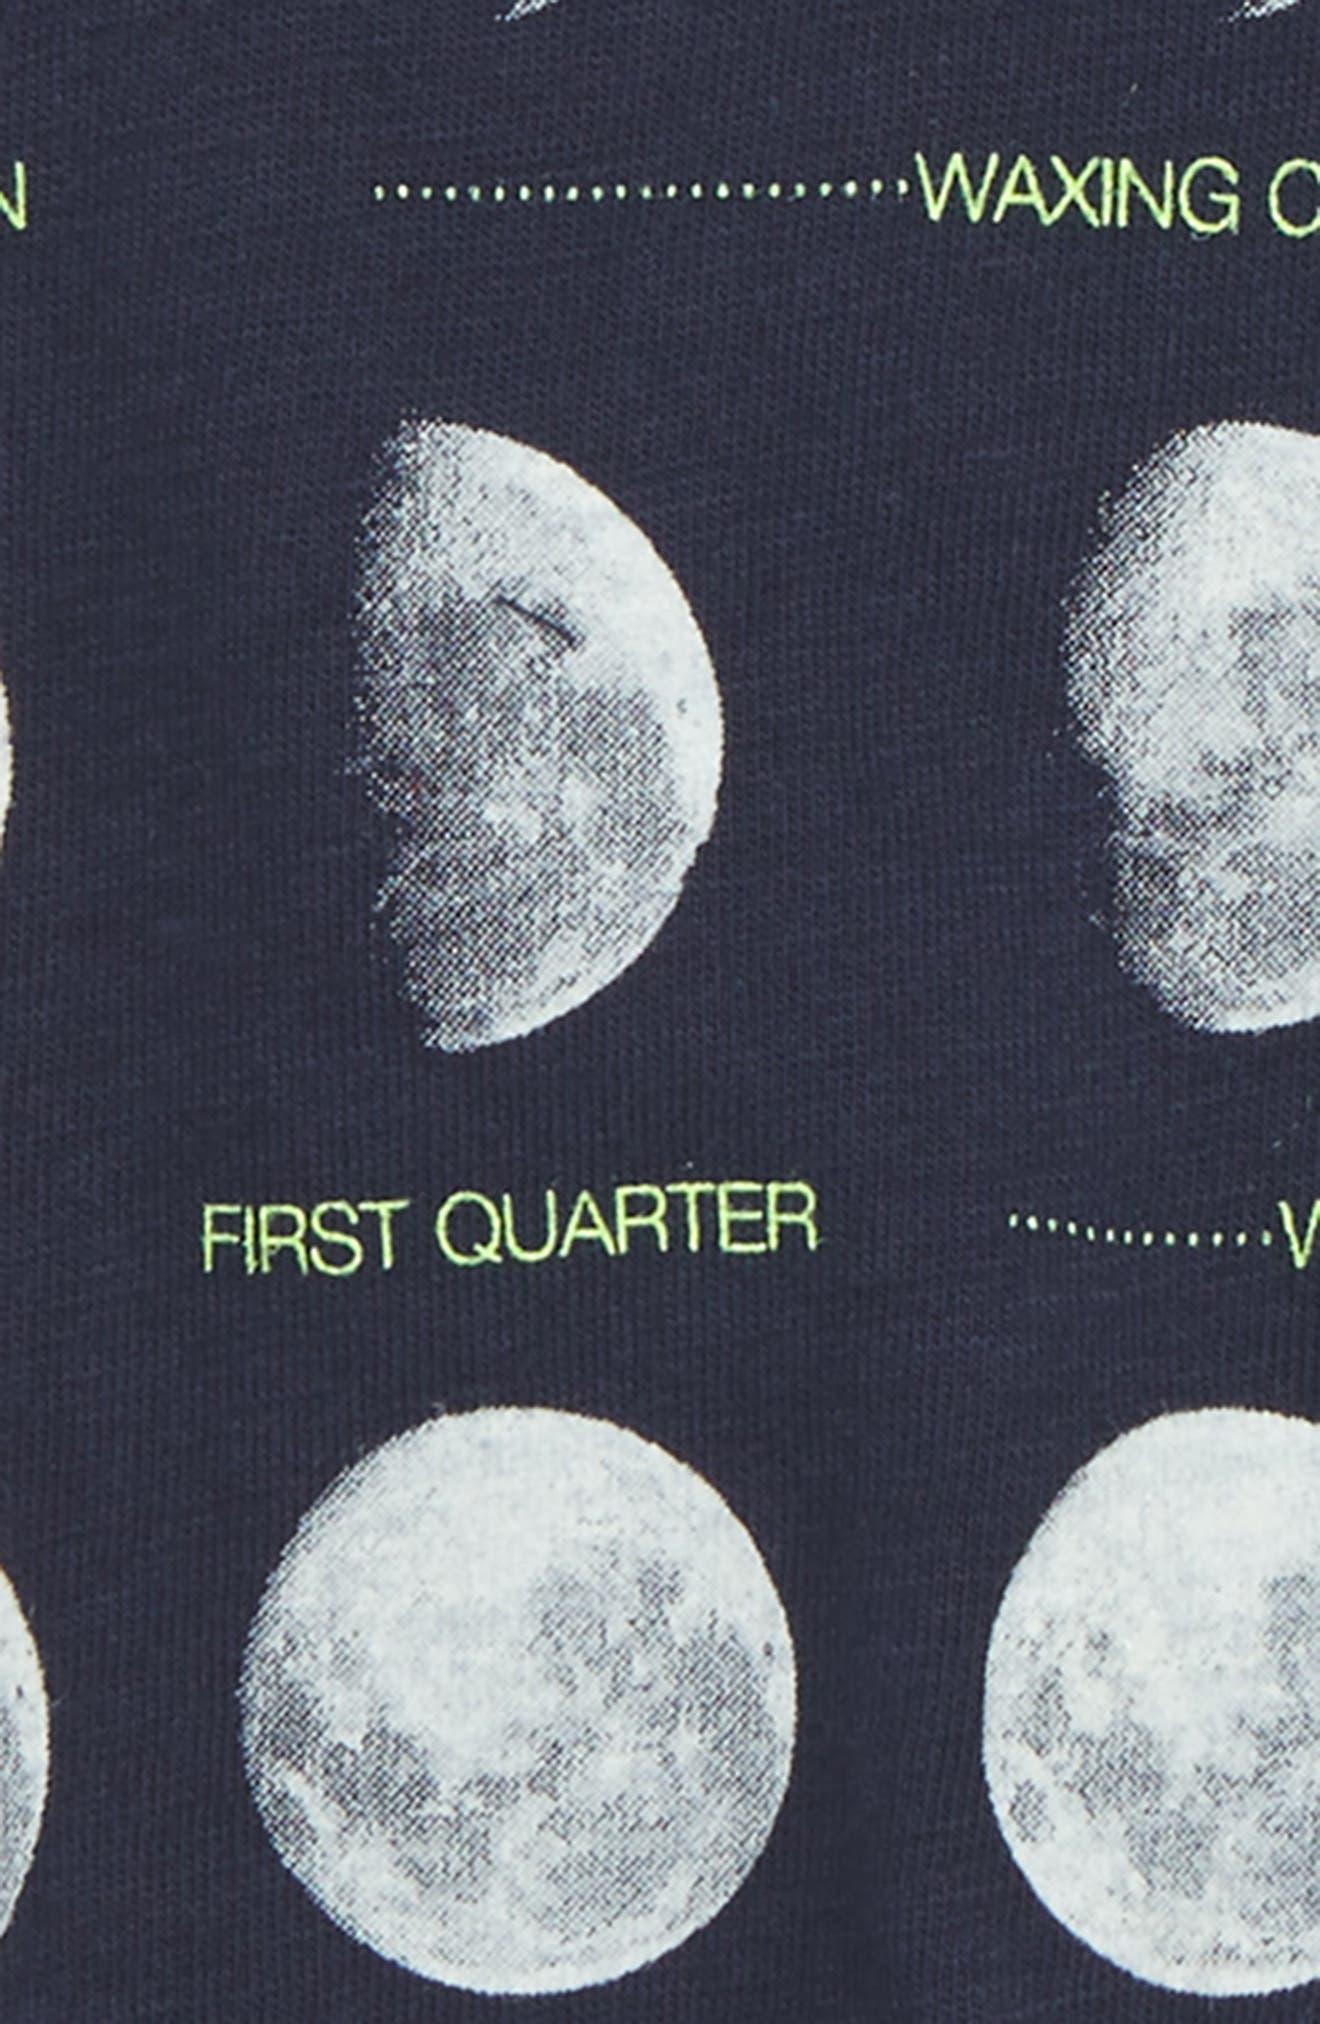 Moons Graphic T-Shirt,                             Alternate thumbnail 2, color,                             Navy